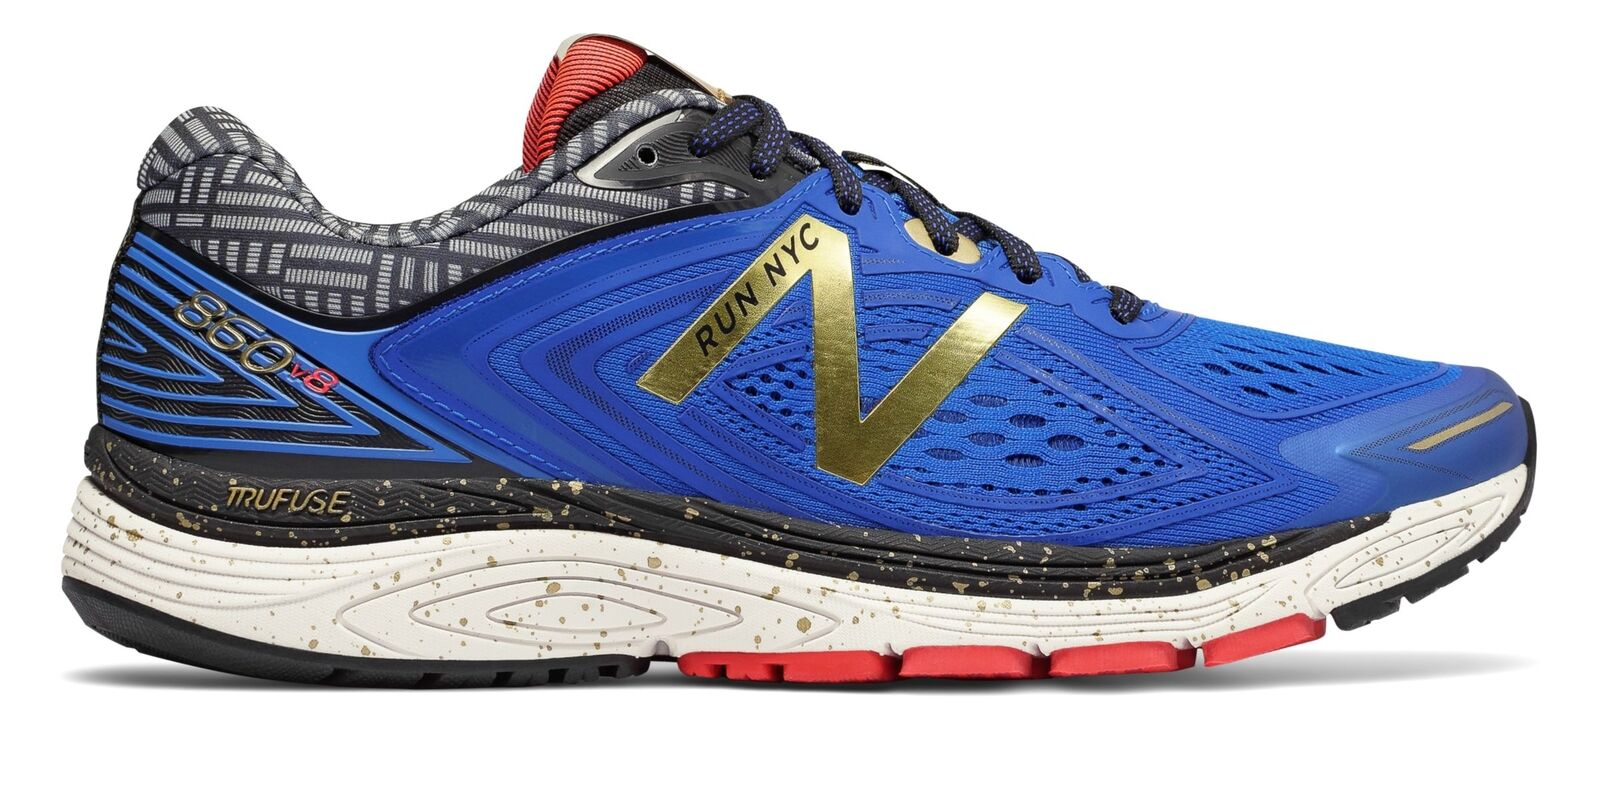 New Balance Men's 860v8 NYC Marathon shoes bluee with gold